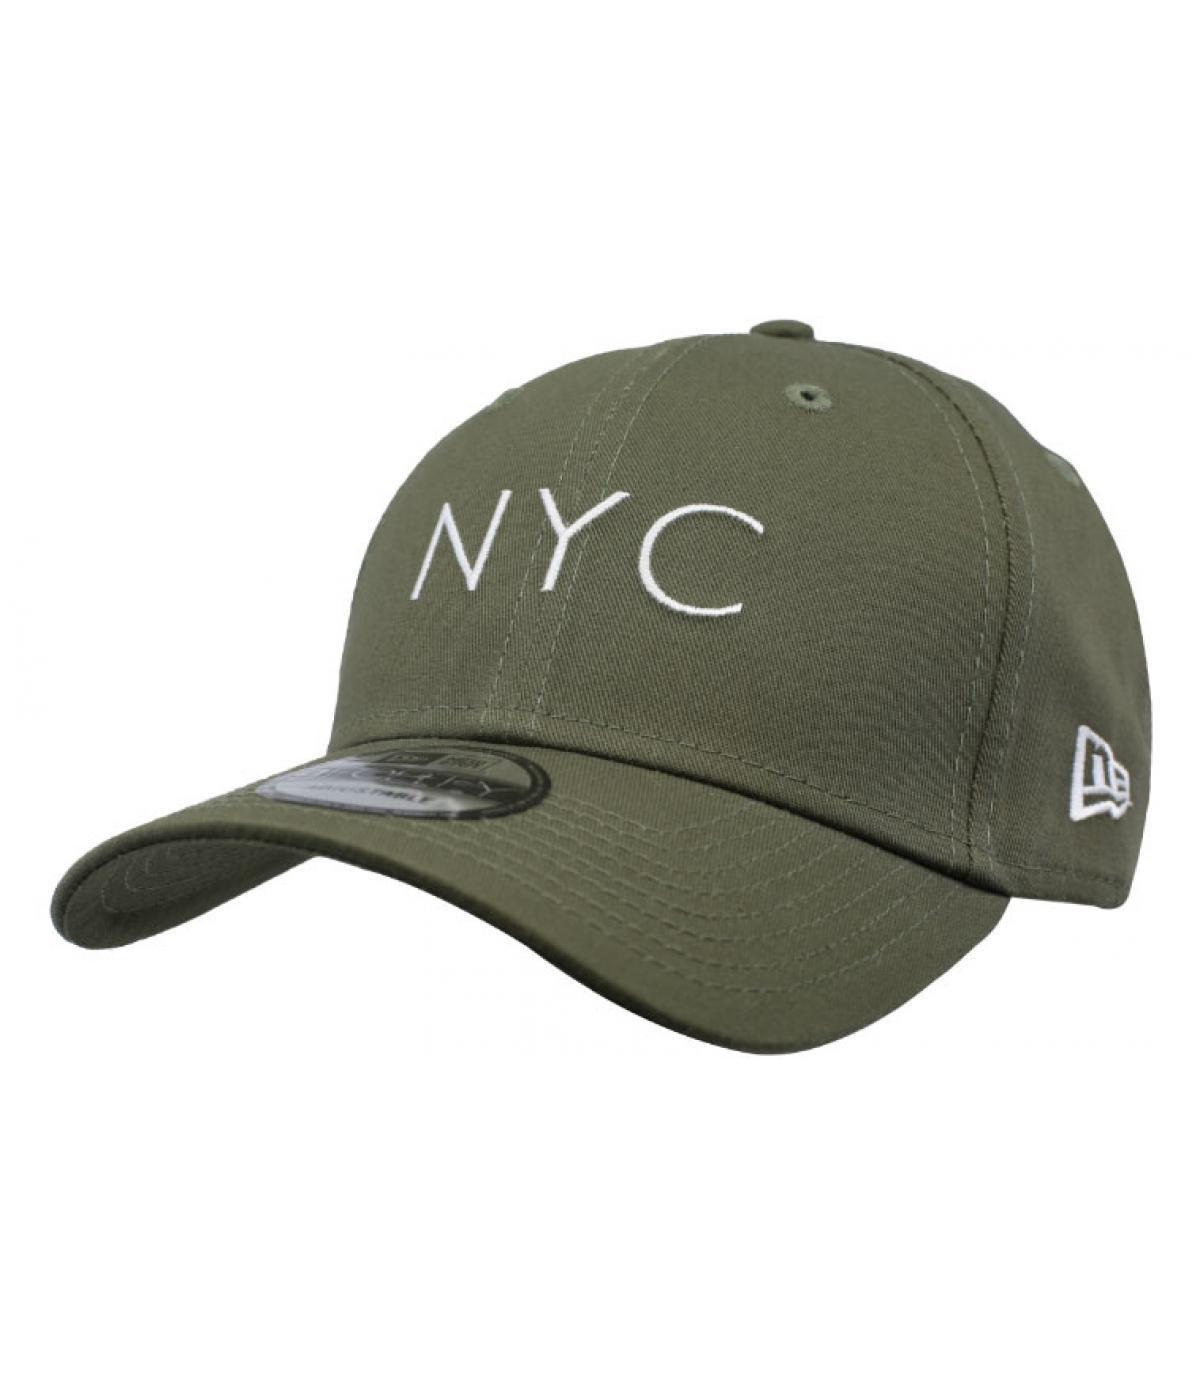 Cap NYC olivgrün